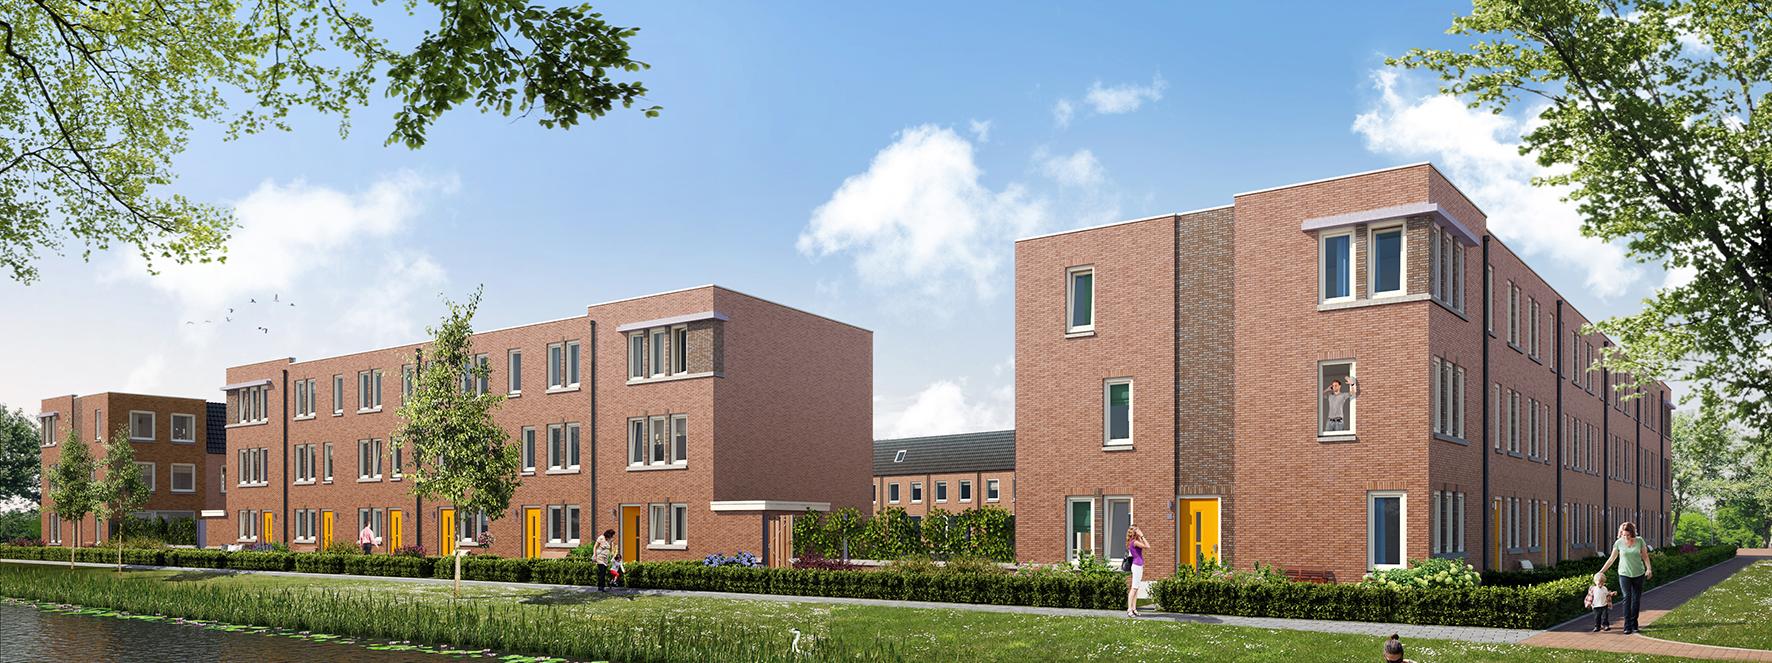 Thunnissen - Bernadottelaan Haarlem - header